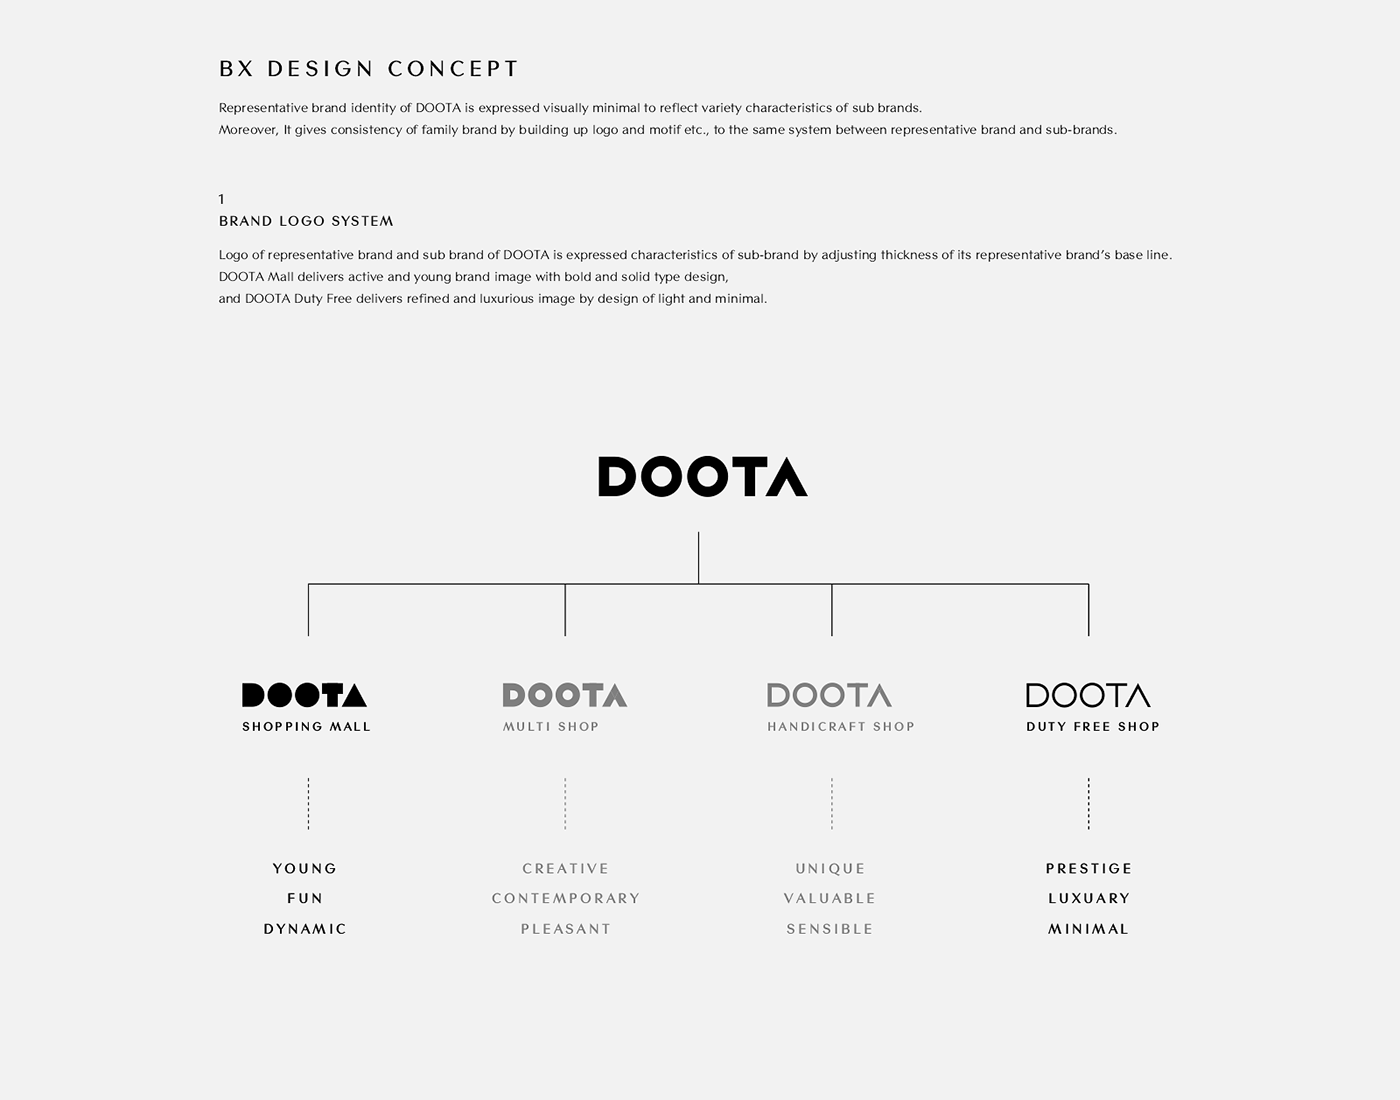 doota dutyfree luxury blend flexible Platform minimal